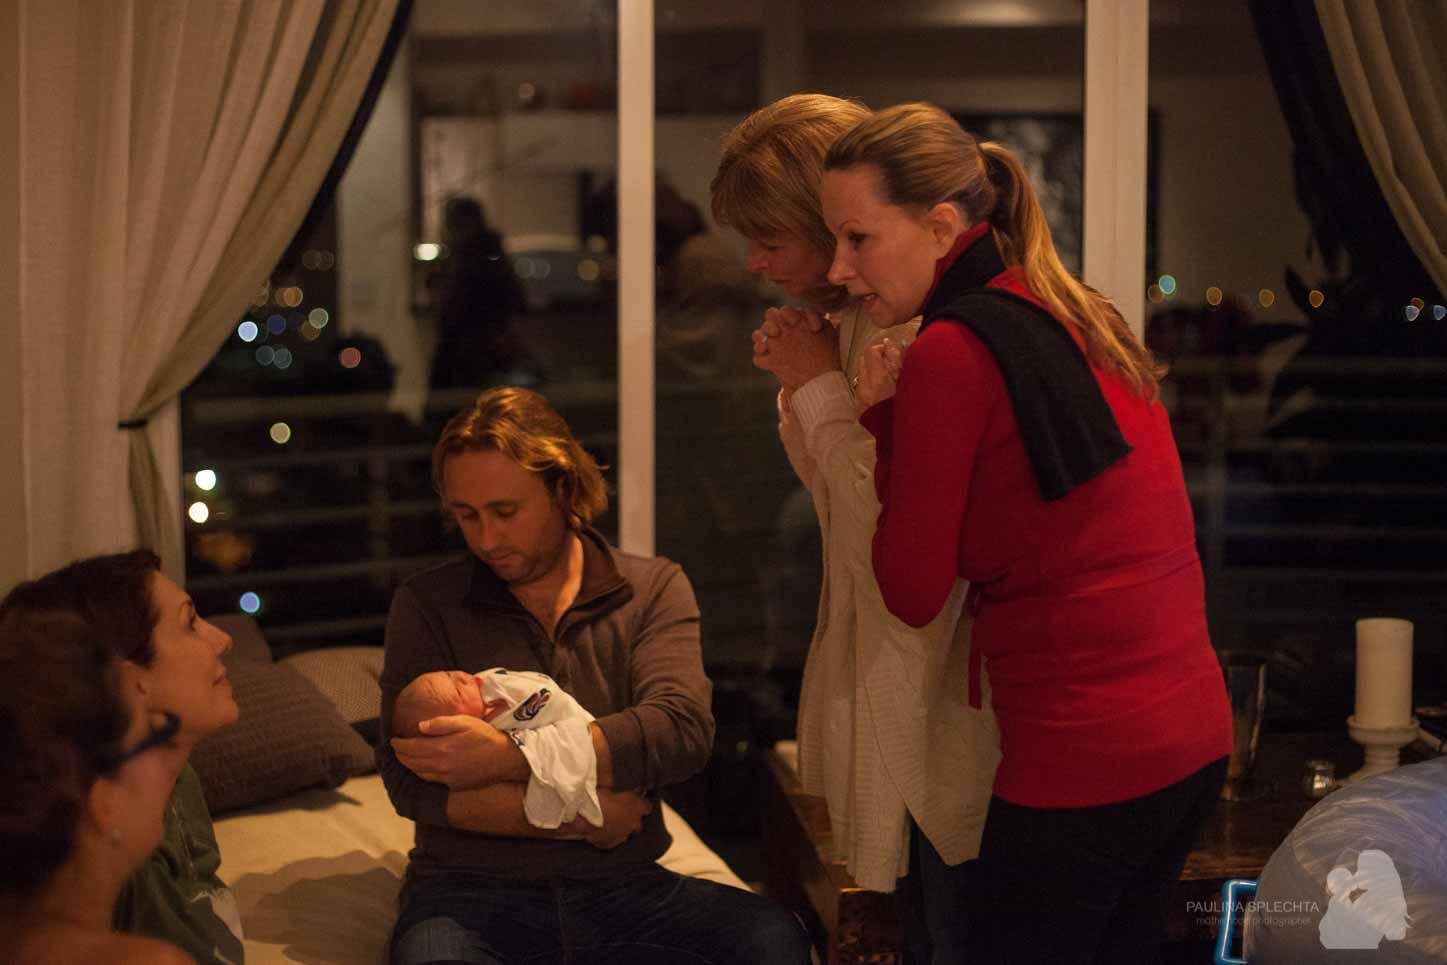 birth-photographer-boca-photography-near-me-birth-center-delray-beach-hollywood-breastfeeding-doula-midwife-childbirth-33.jpg